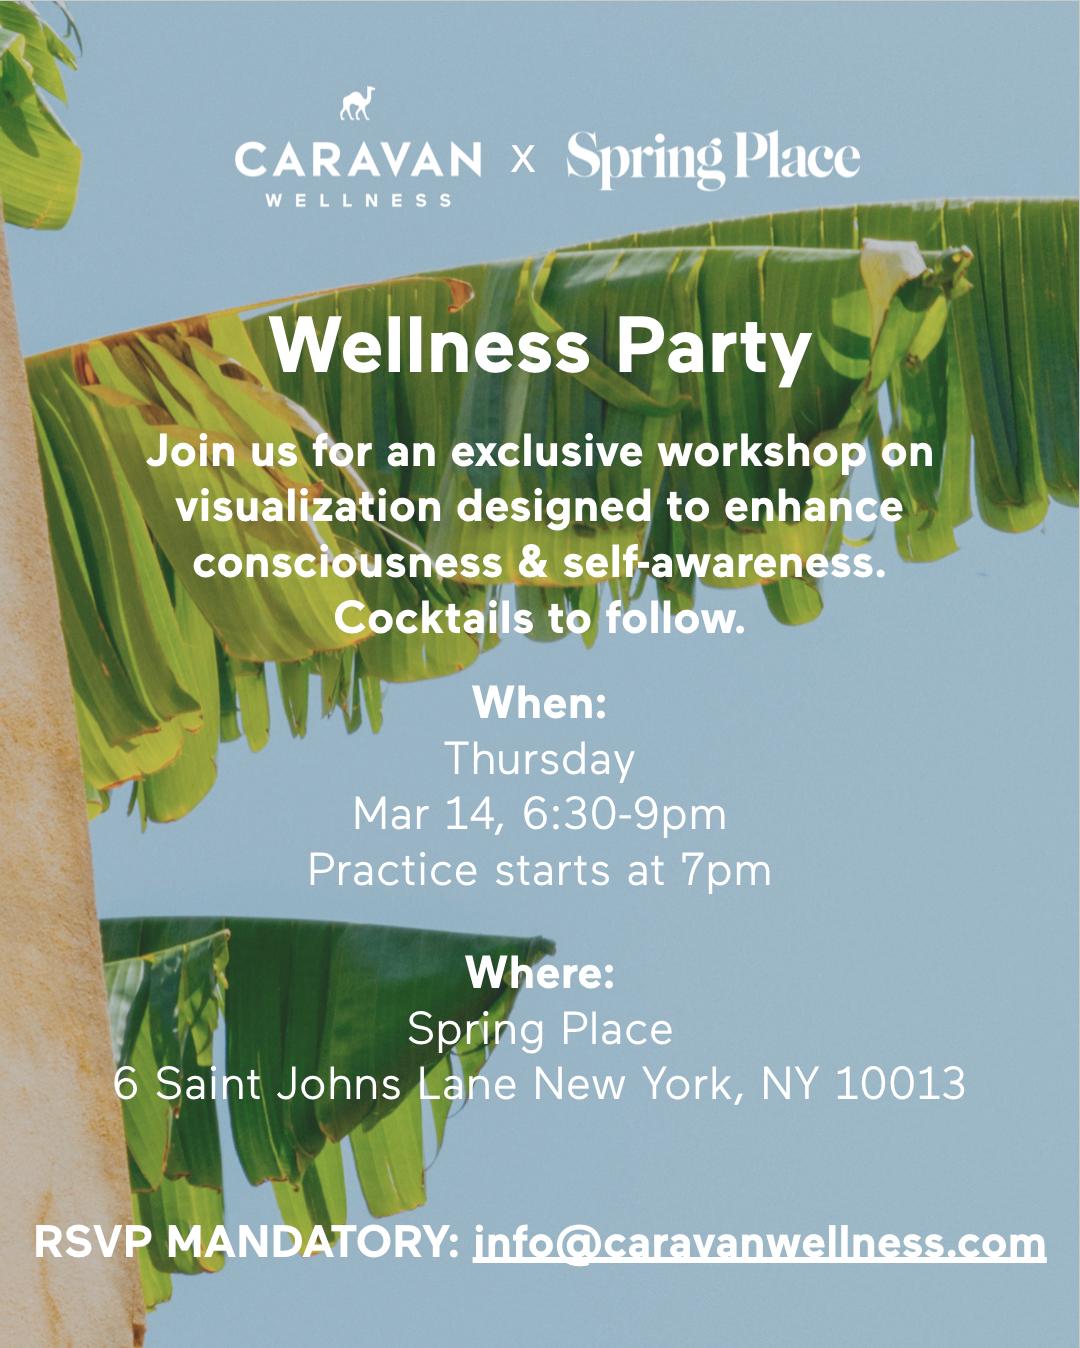 Caravan Wellness - Introduction to visual meditation